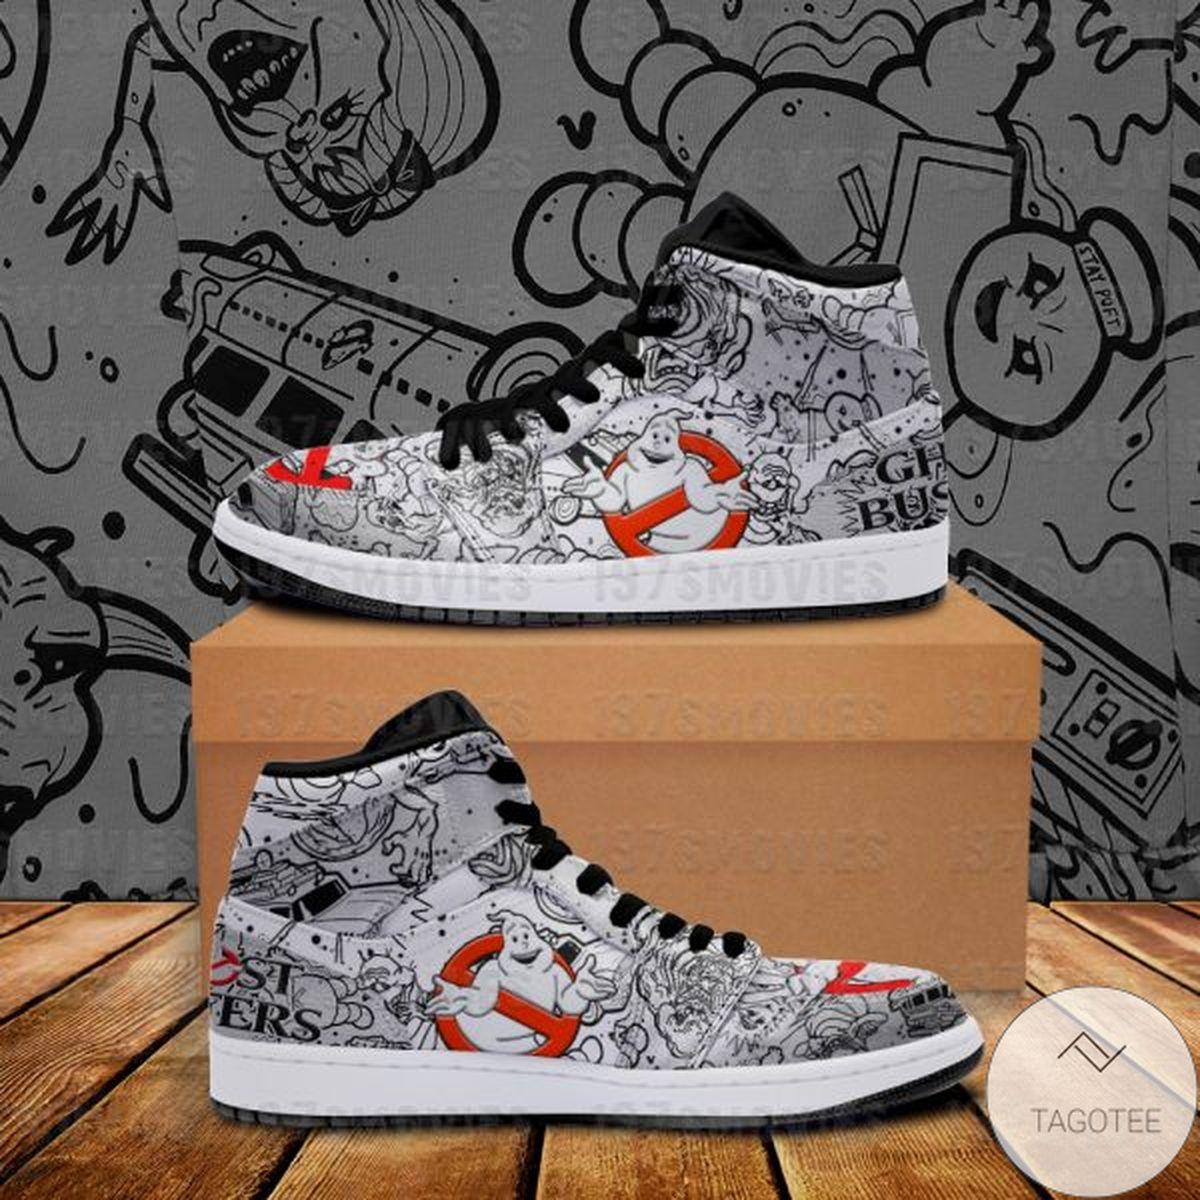 Fast Shipping Ghostbusters Sneaker Air Jordan High Top Shoes